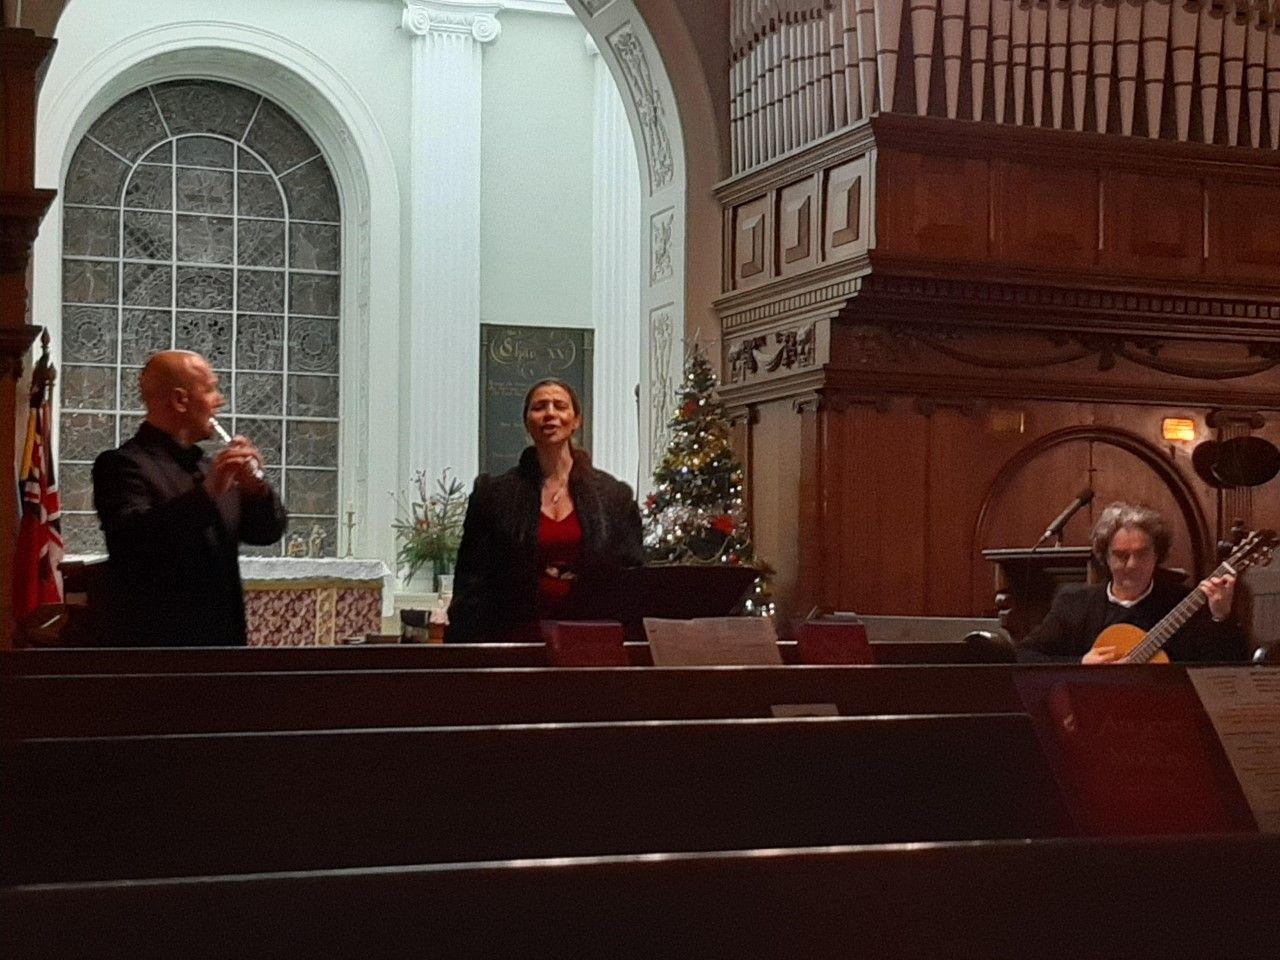 Falésia Concert given 18th December 2020